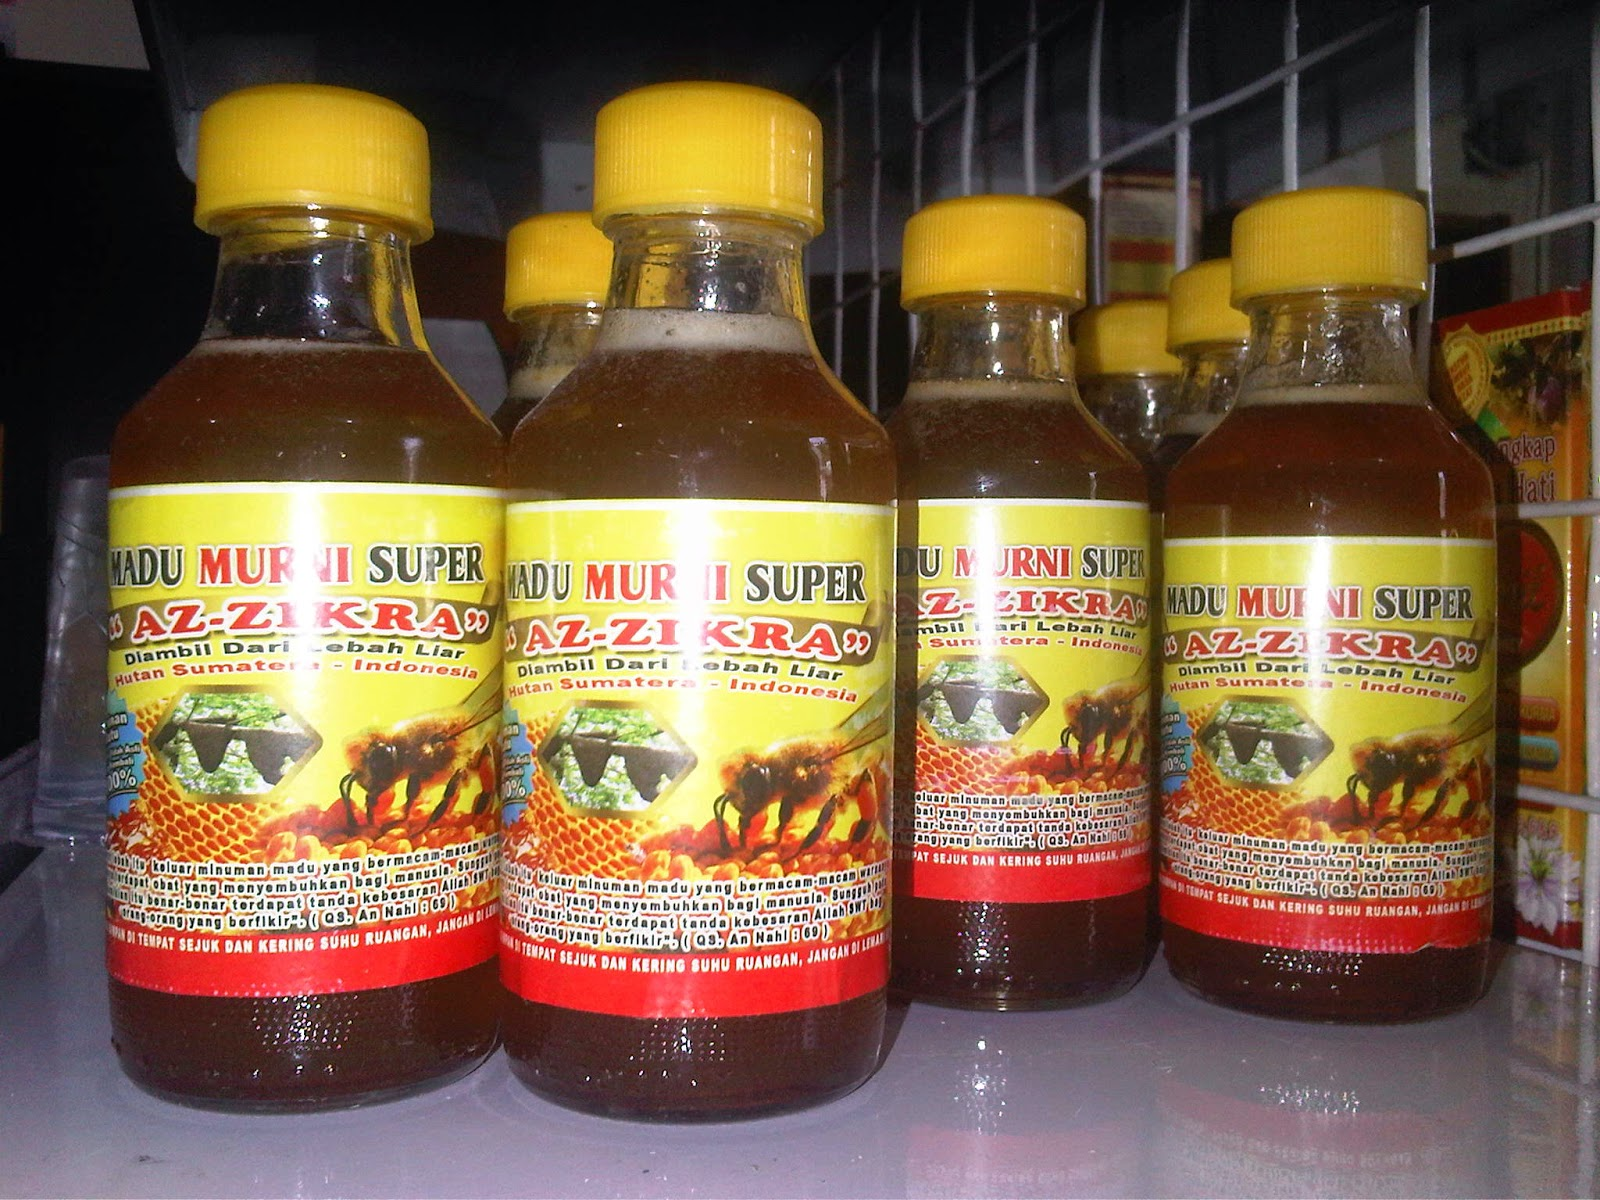 Madu Murni Super Az Zikra 150 Ml Hutan Sumatera Indo Sentra Keutamaan Lebah Mengambil Nektar Dari Berbagai Bunga Termasuk Tumbuhan Obat Obatan Produk Organik Dipanen Langsung